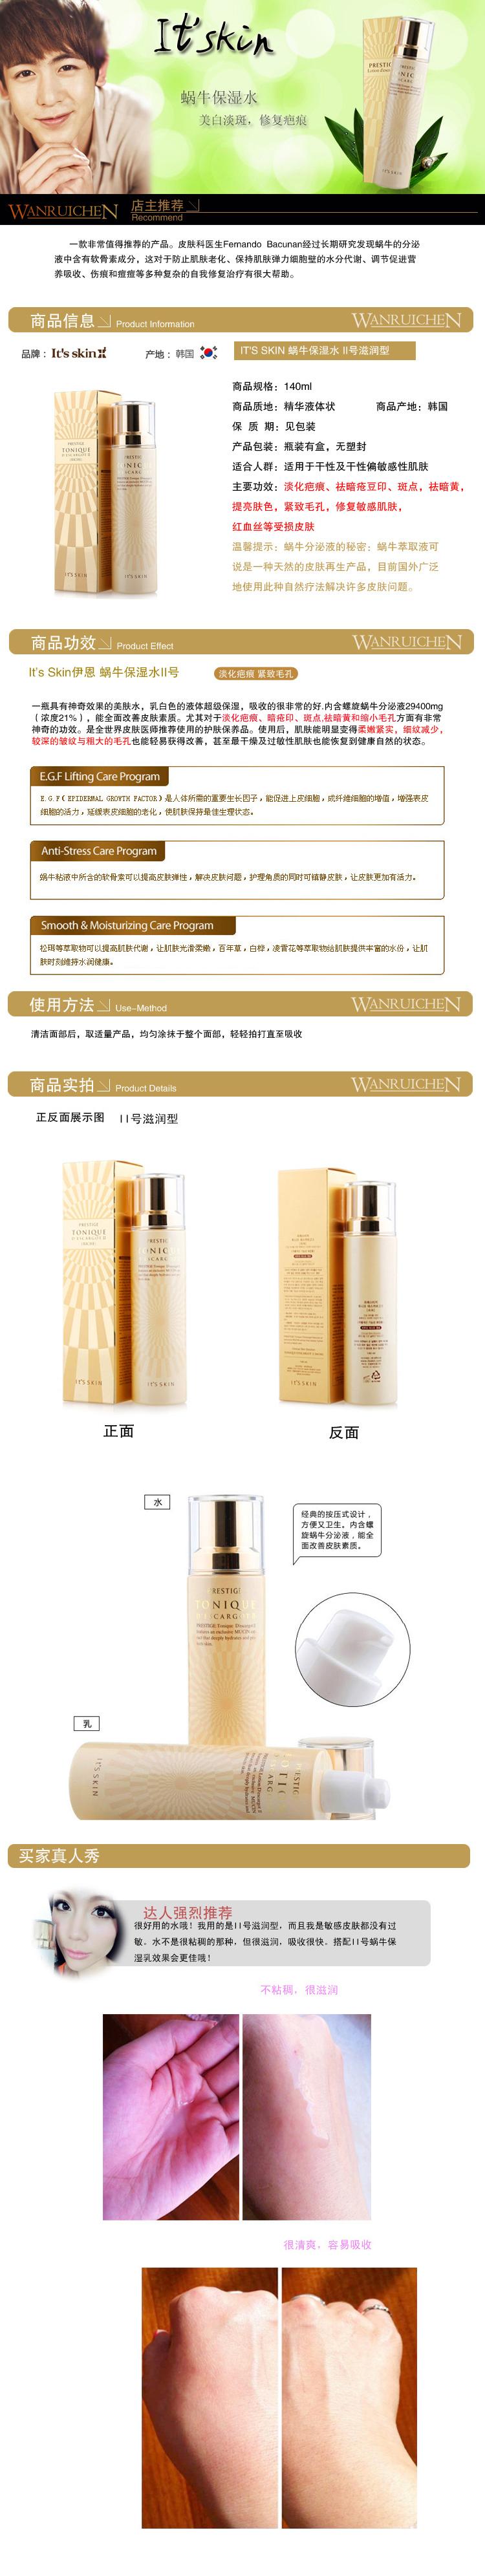 [ It\'s skin ] 威望专营来自D'蜗牛2 140 ml干燥的皮肤类型。